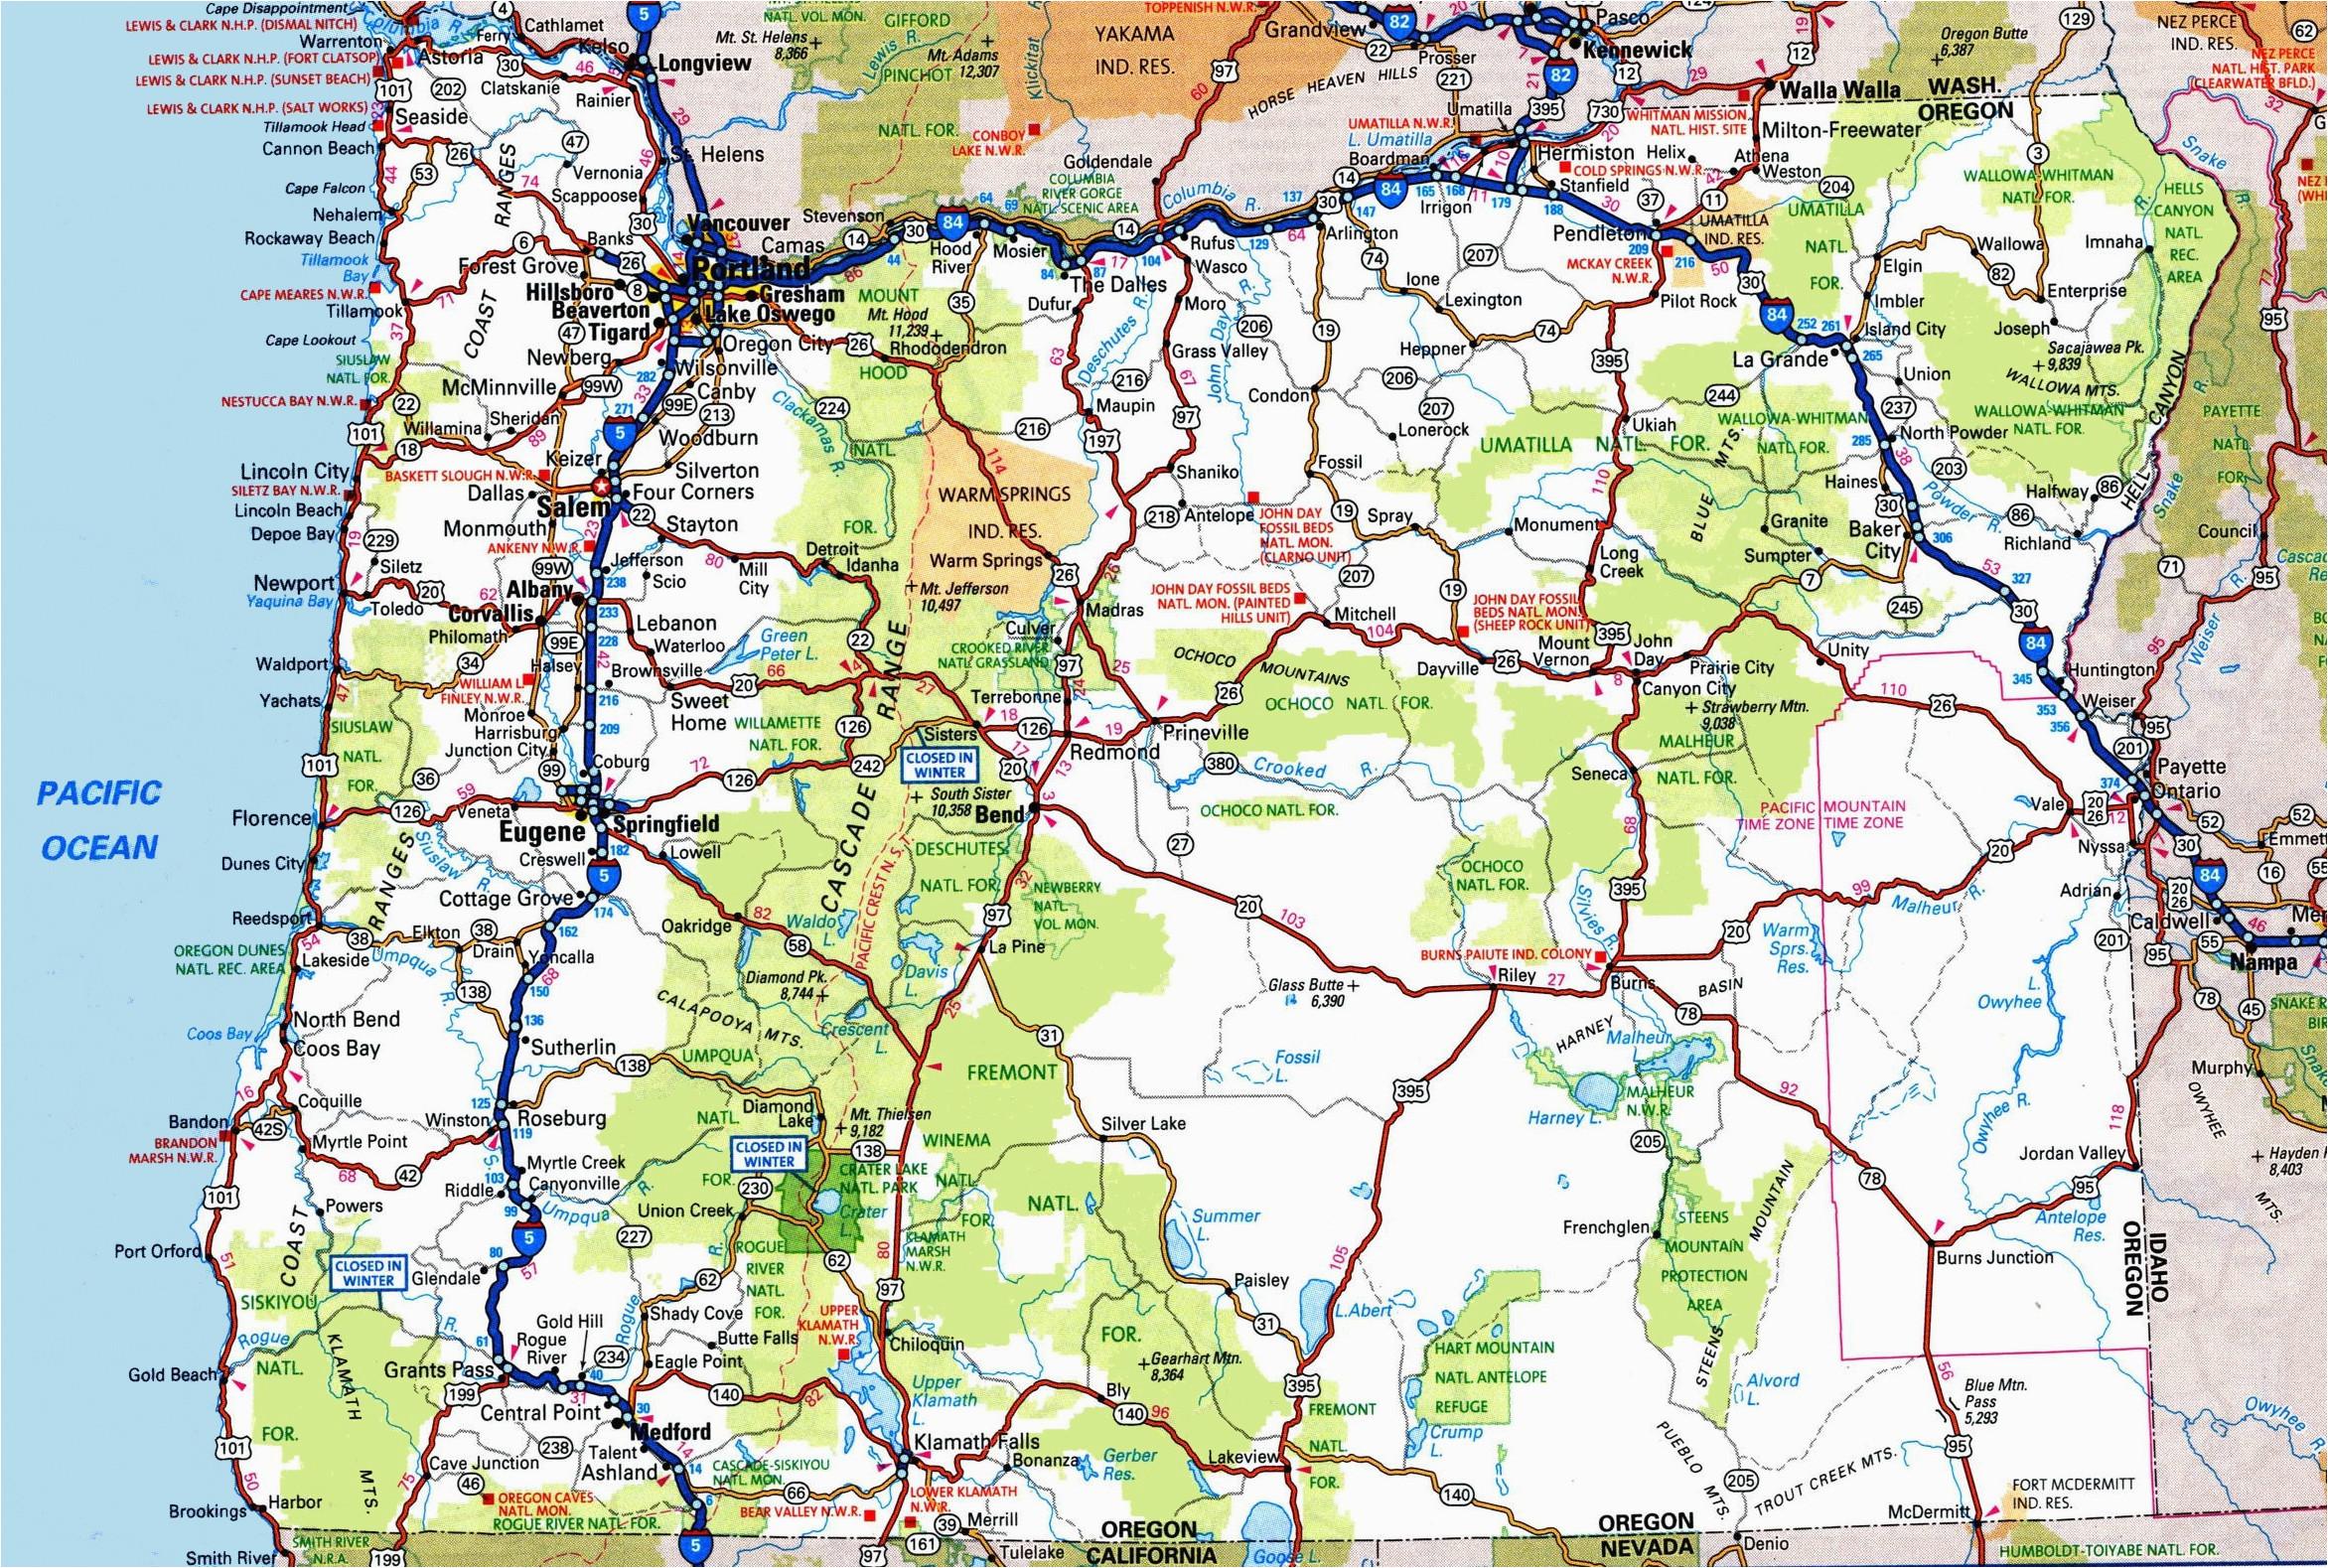 Traffic Map Portland oregon oregon Road Map – secretmuseum on abc news traffic, katu traffic, portland traffic, koin traffic, ksl traffic, fox 12 traffic, wkyc traffic, san clemente traffic,